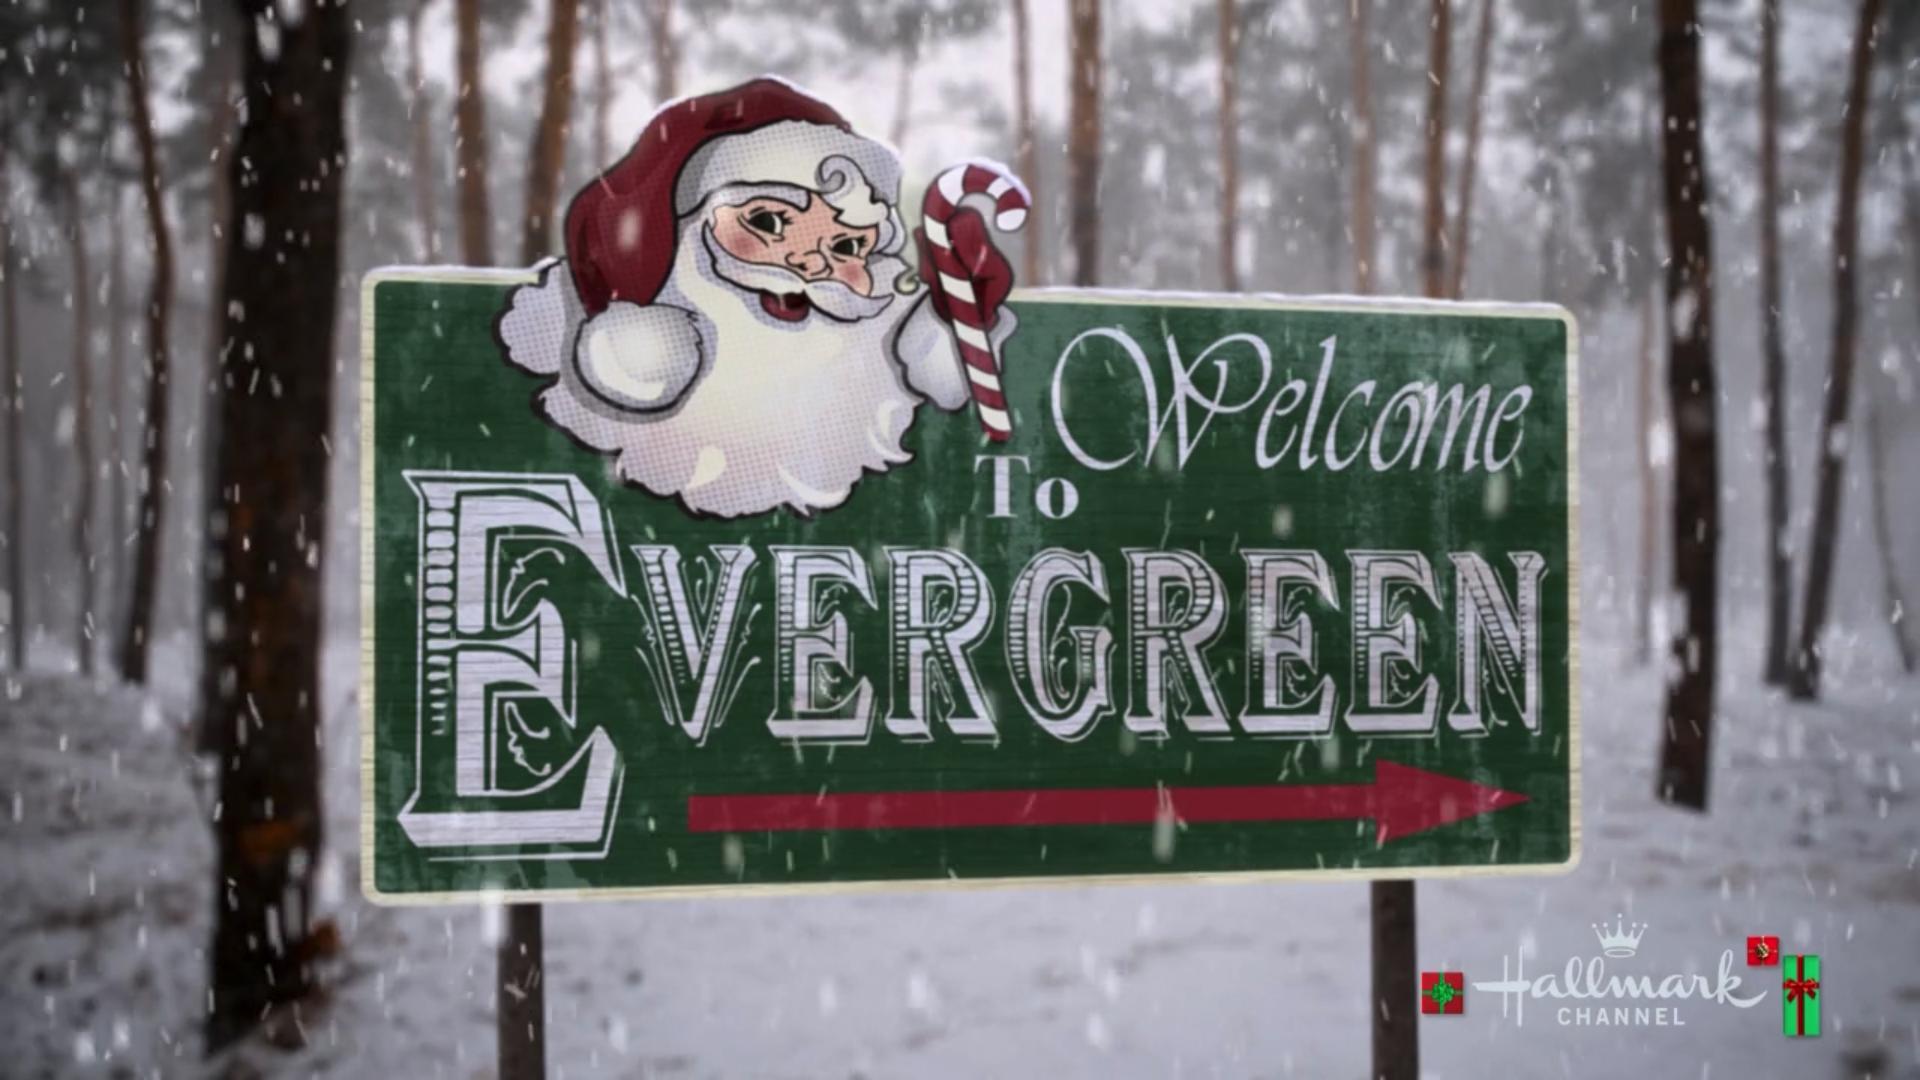 Christmas In Evergreen Hallmark Movie.Christmas In Evergreen Recap Review The Hallremark